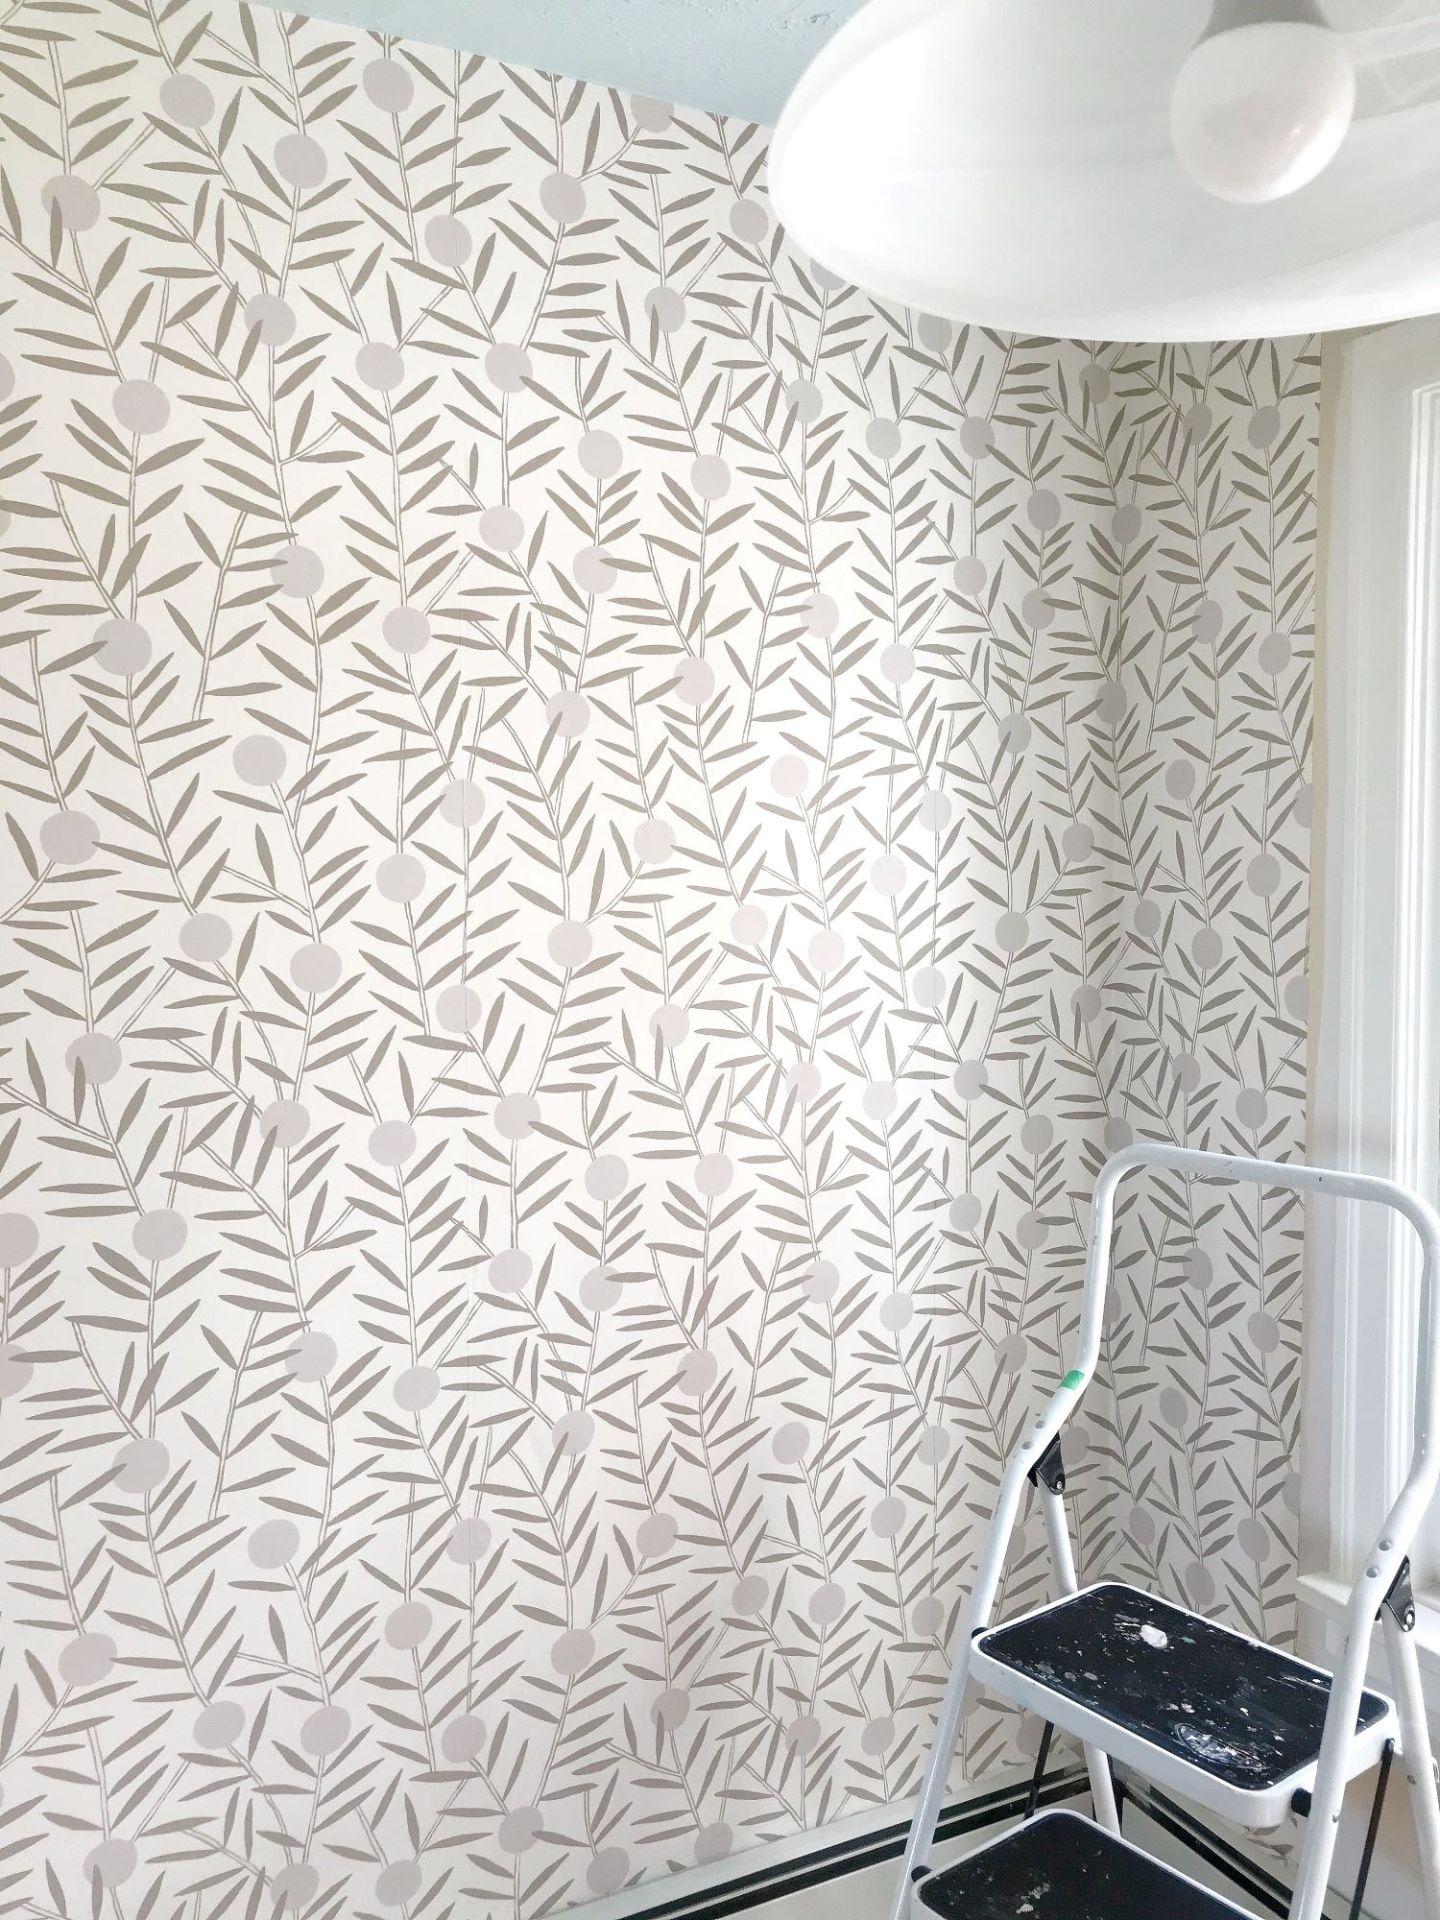 Non-Pasted Wallpaper DIY